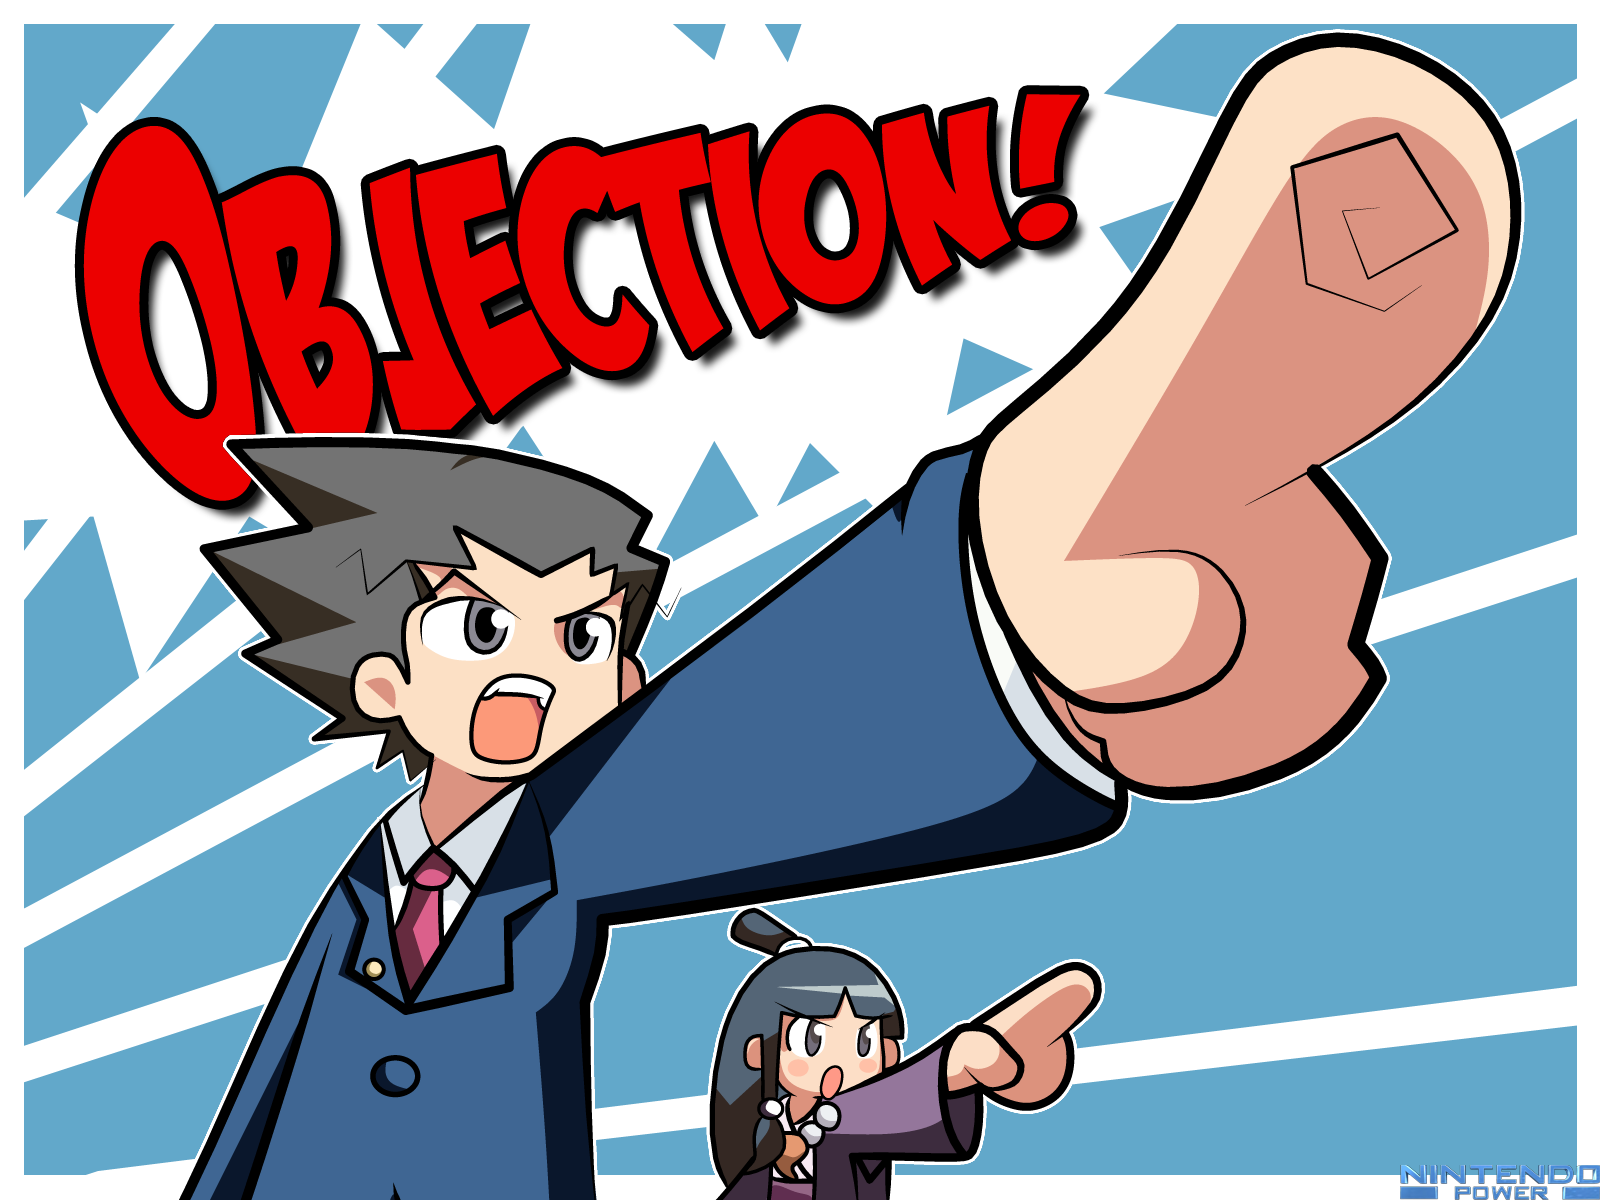 Objection Chibi Version Phoenix Wright Anime Images Ace